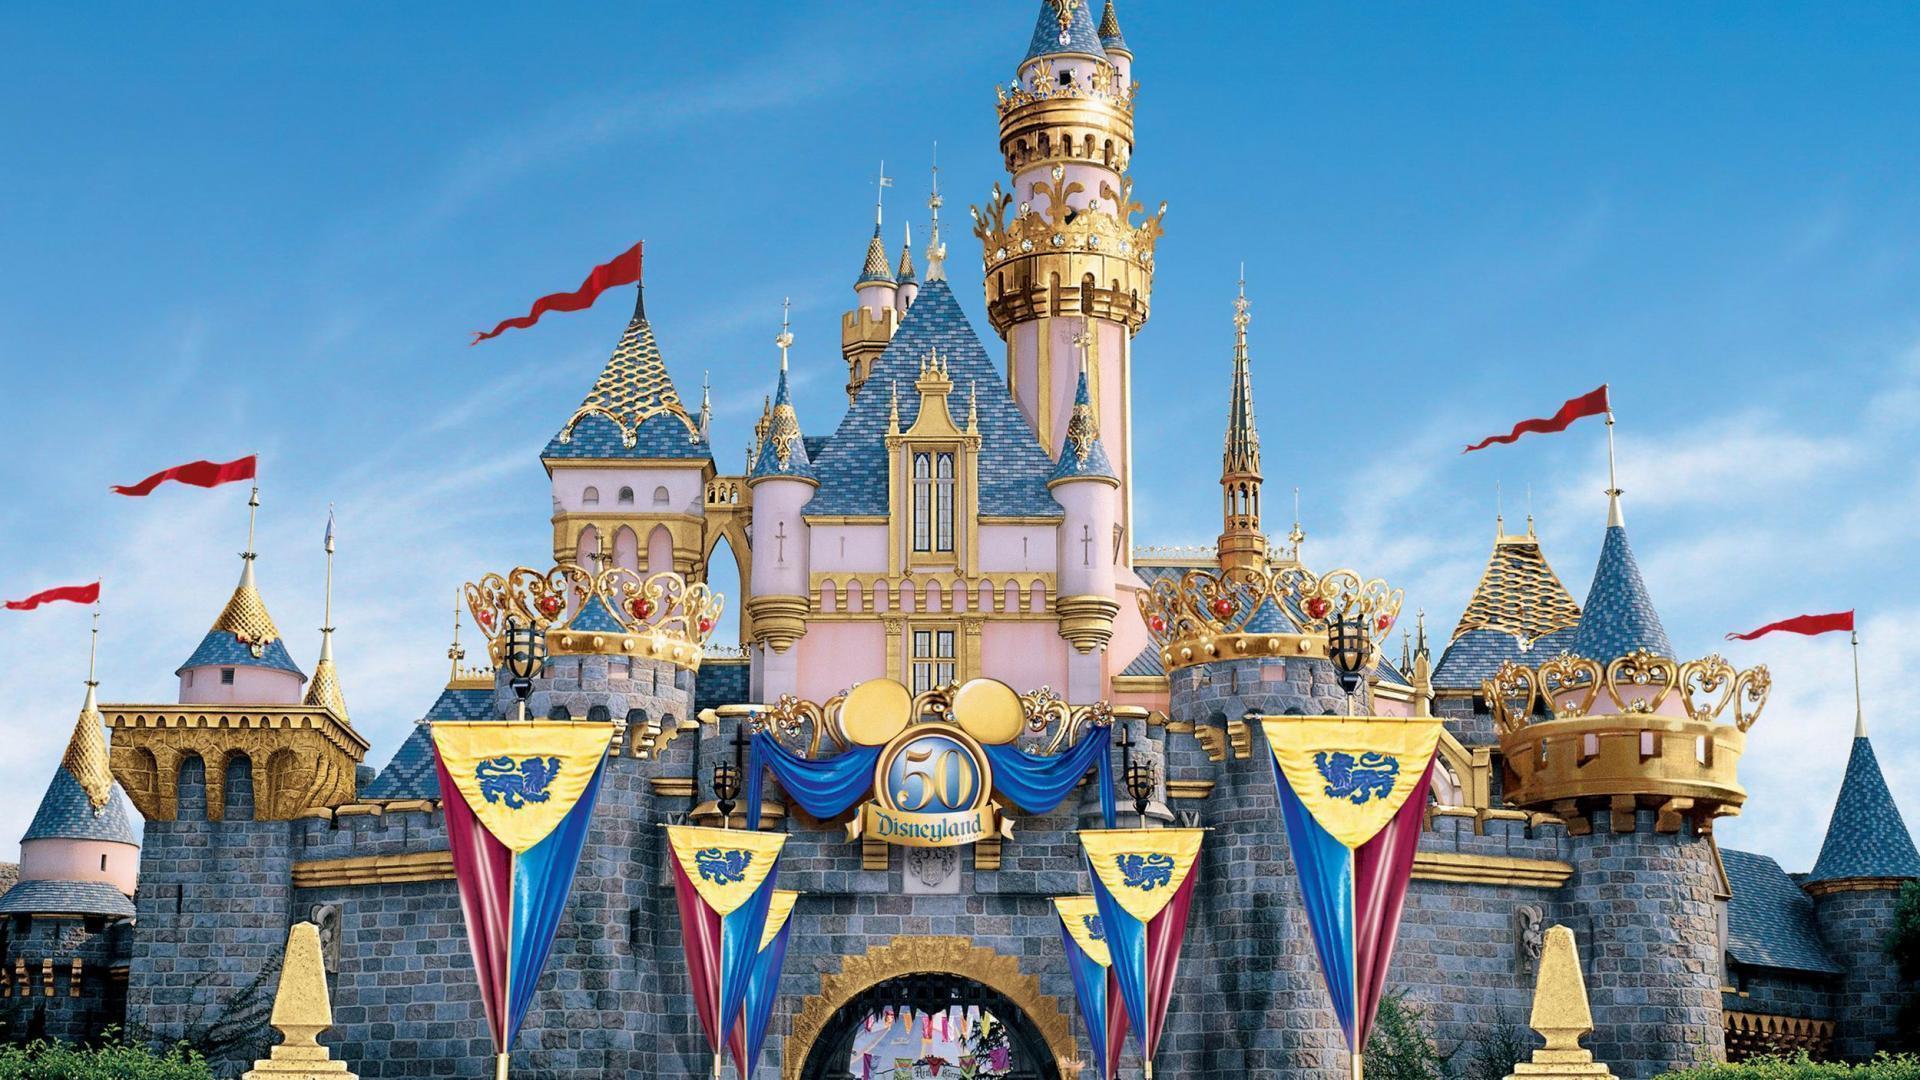 Disneyland Hd Wallpapers Wallpaper Cave